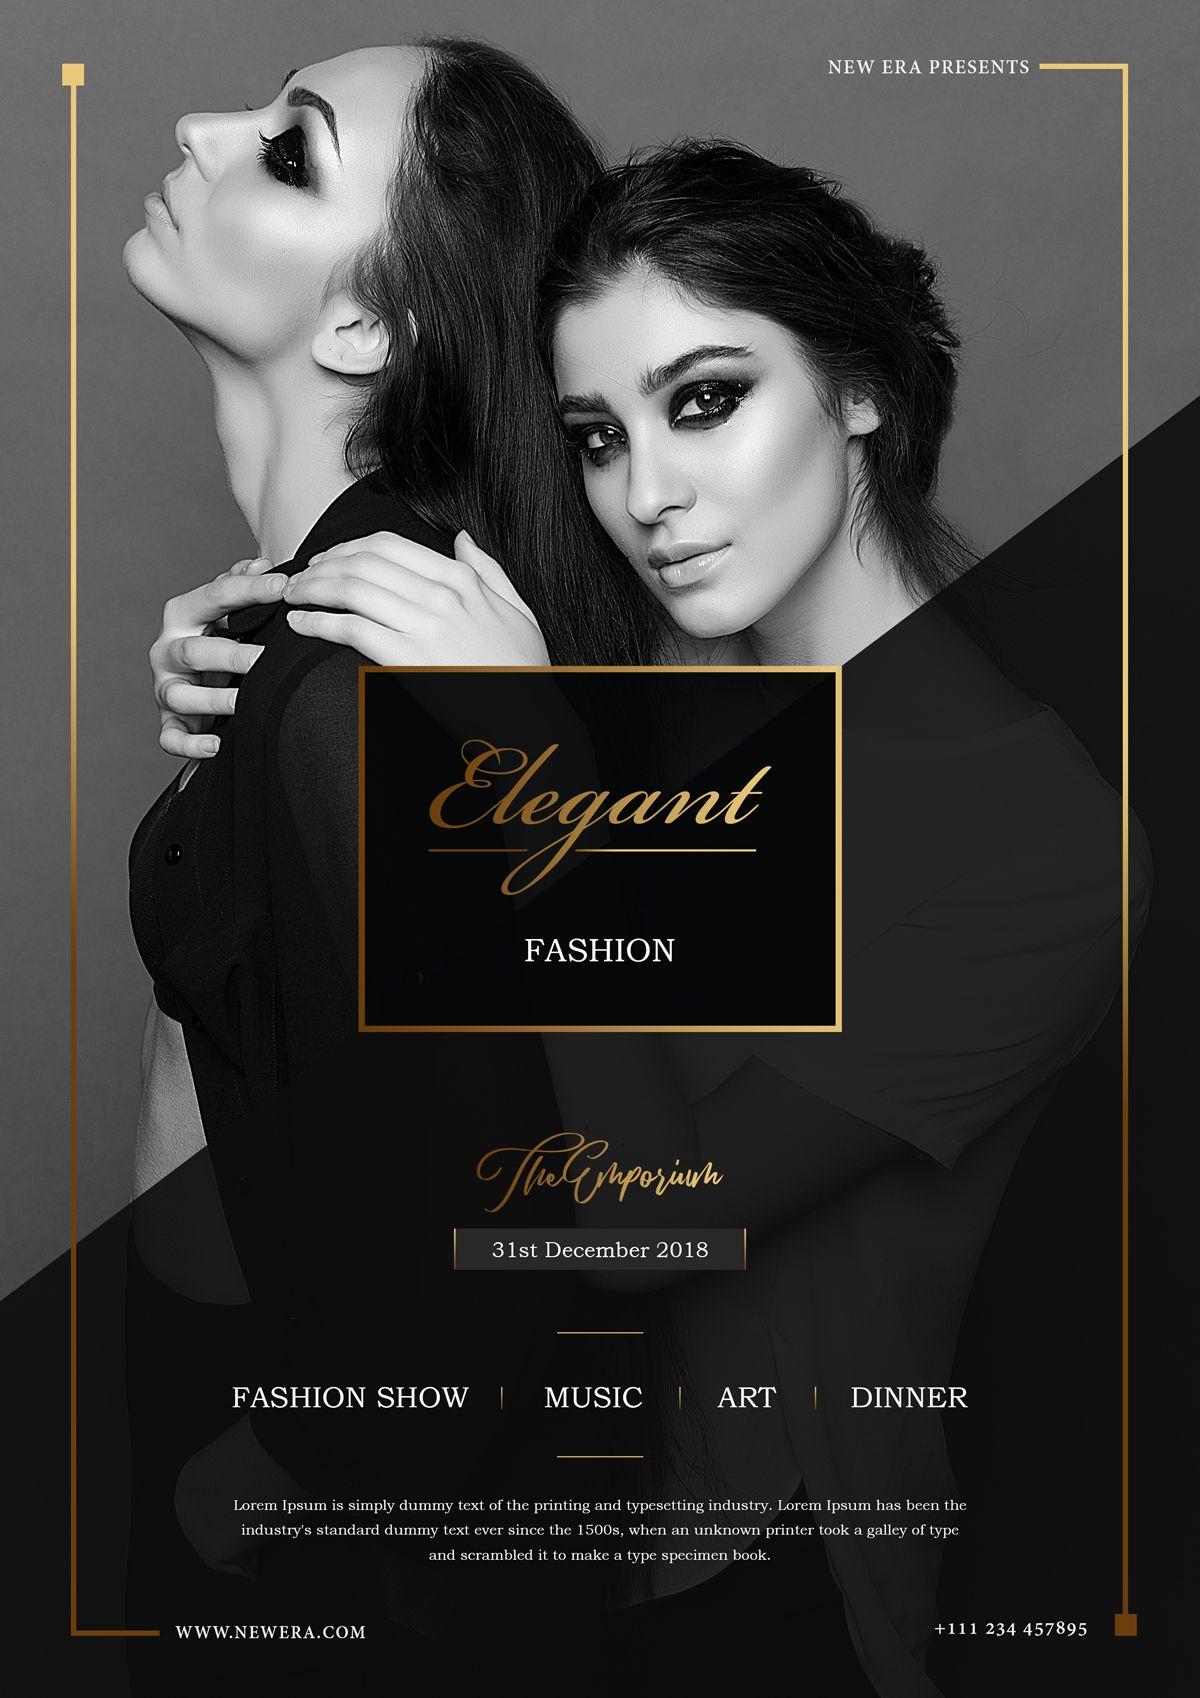 Fashion Show Flyer Fashion Poster Design Fashion Show Poster Fashion Poster